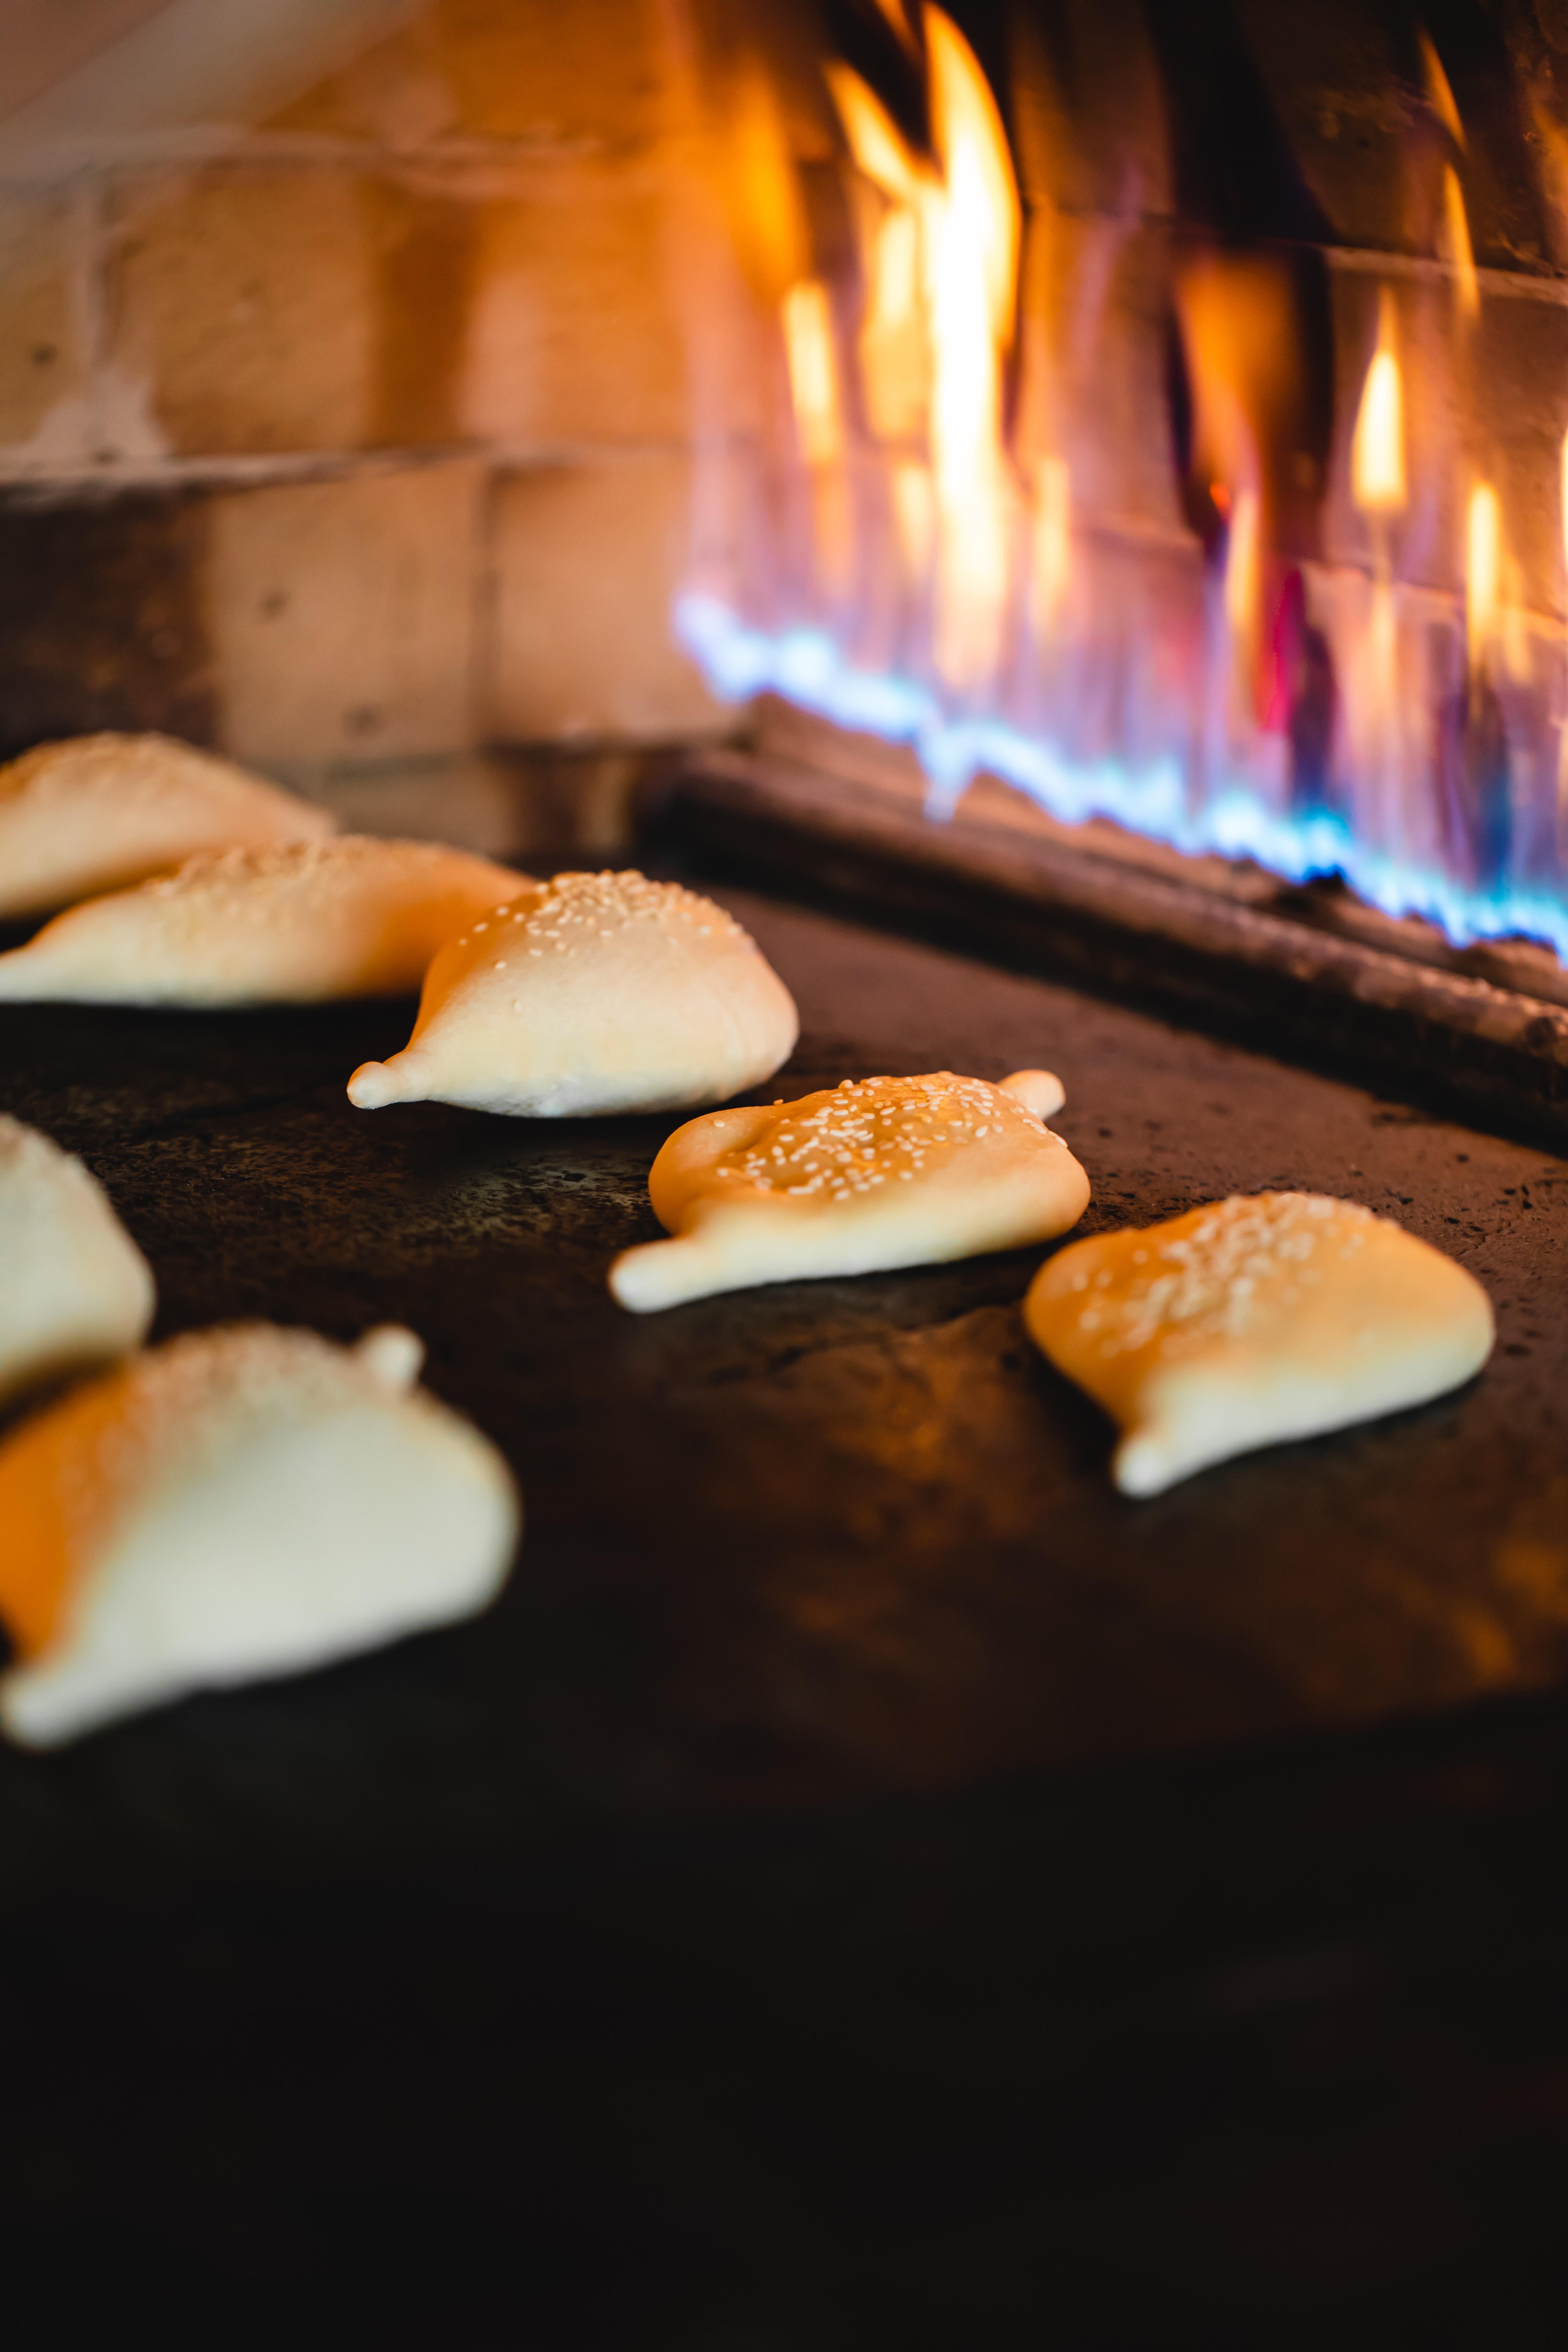 bake pastries